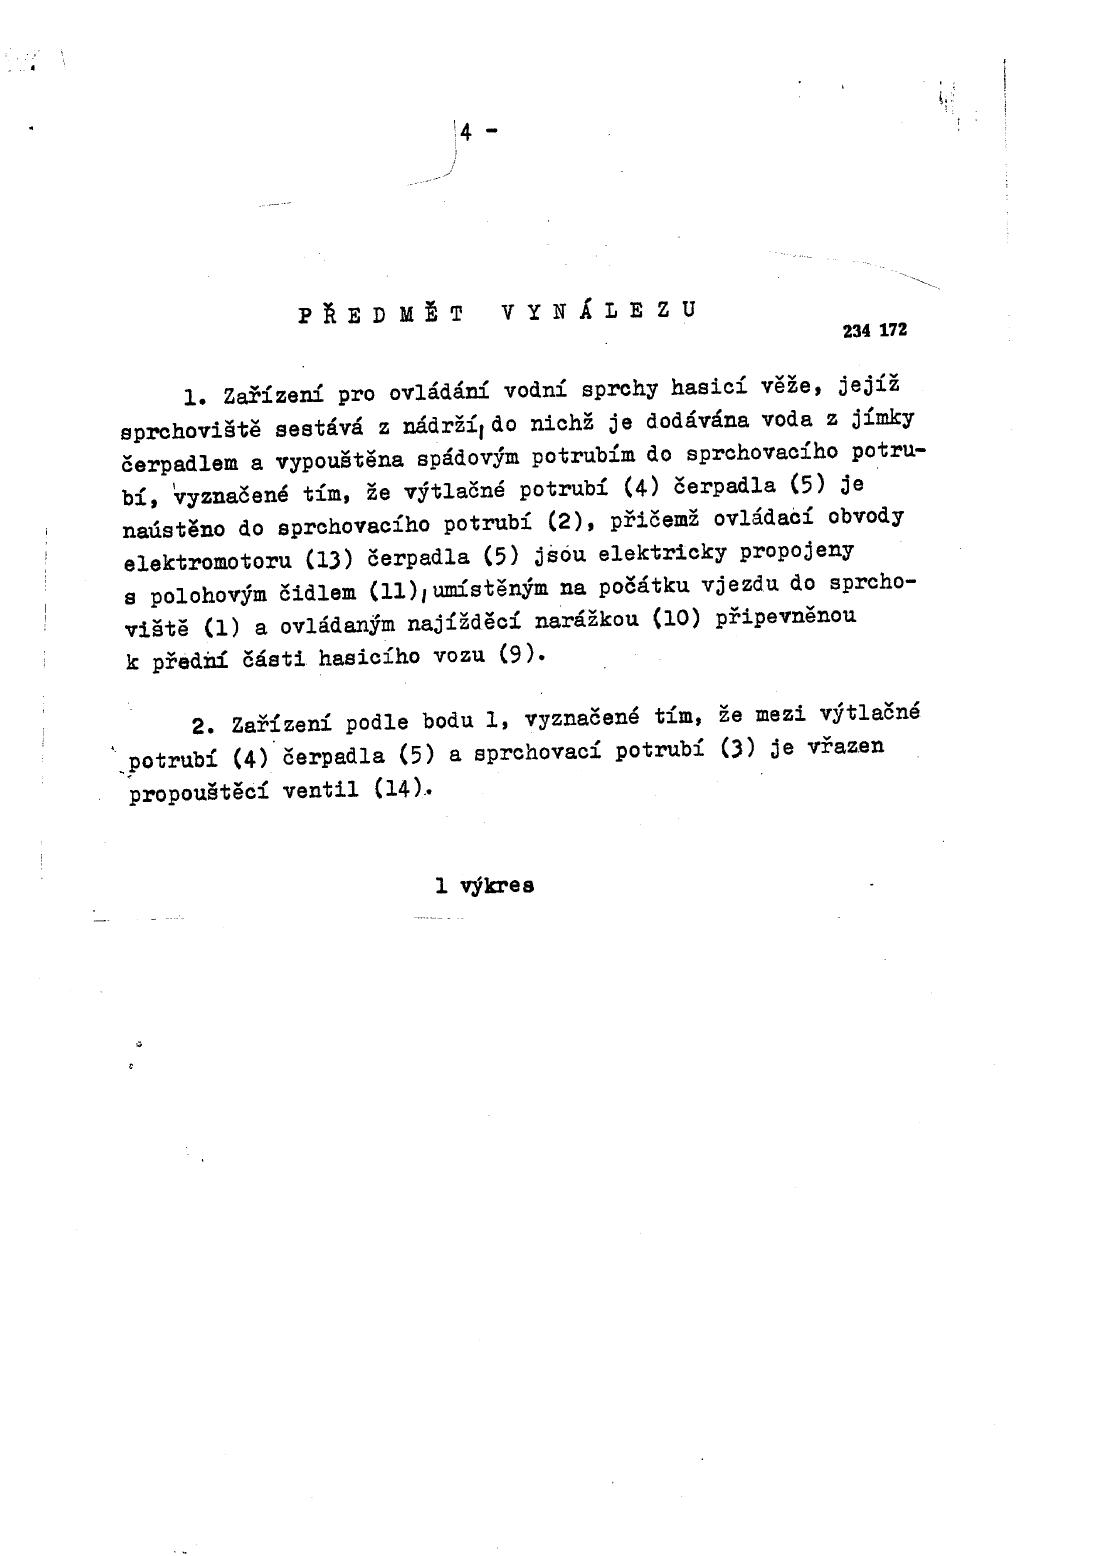 Zarizeni Pro Ovladani Vodni Sprchy Hasici Veze 01 04 1987 234172